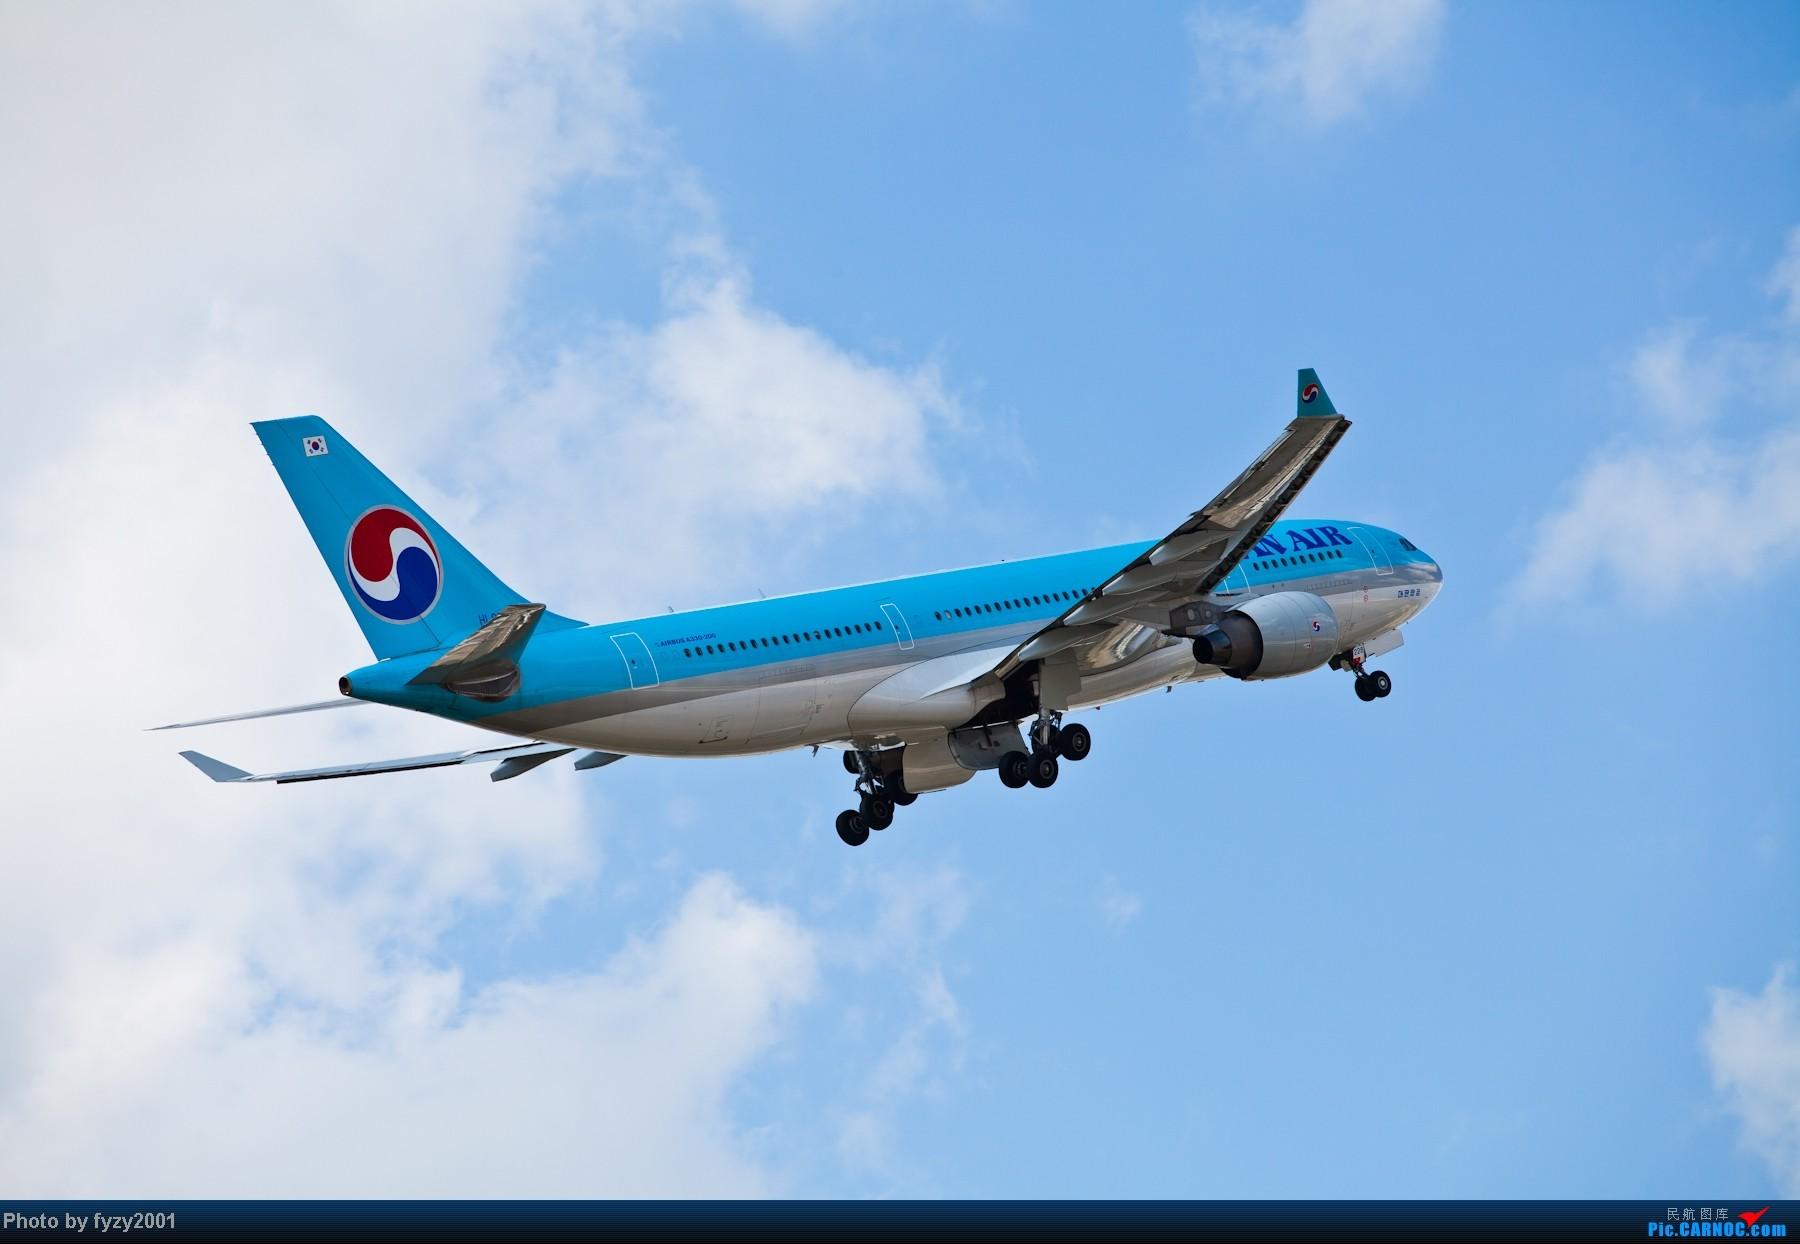 Re:[原创][无锡西站]长假PVG蹲守~~~~只发大图,多图杀猫~~~~ AIRBUS A330-200 HL8228 中国上海浦东机场